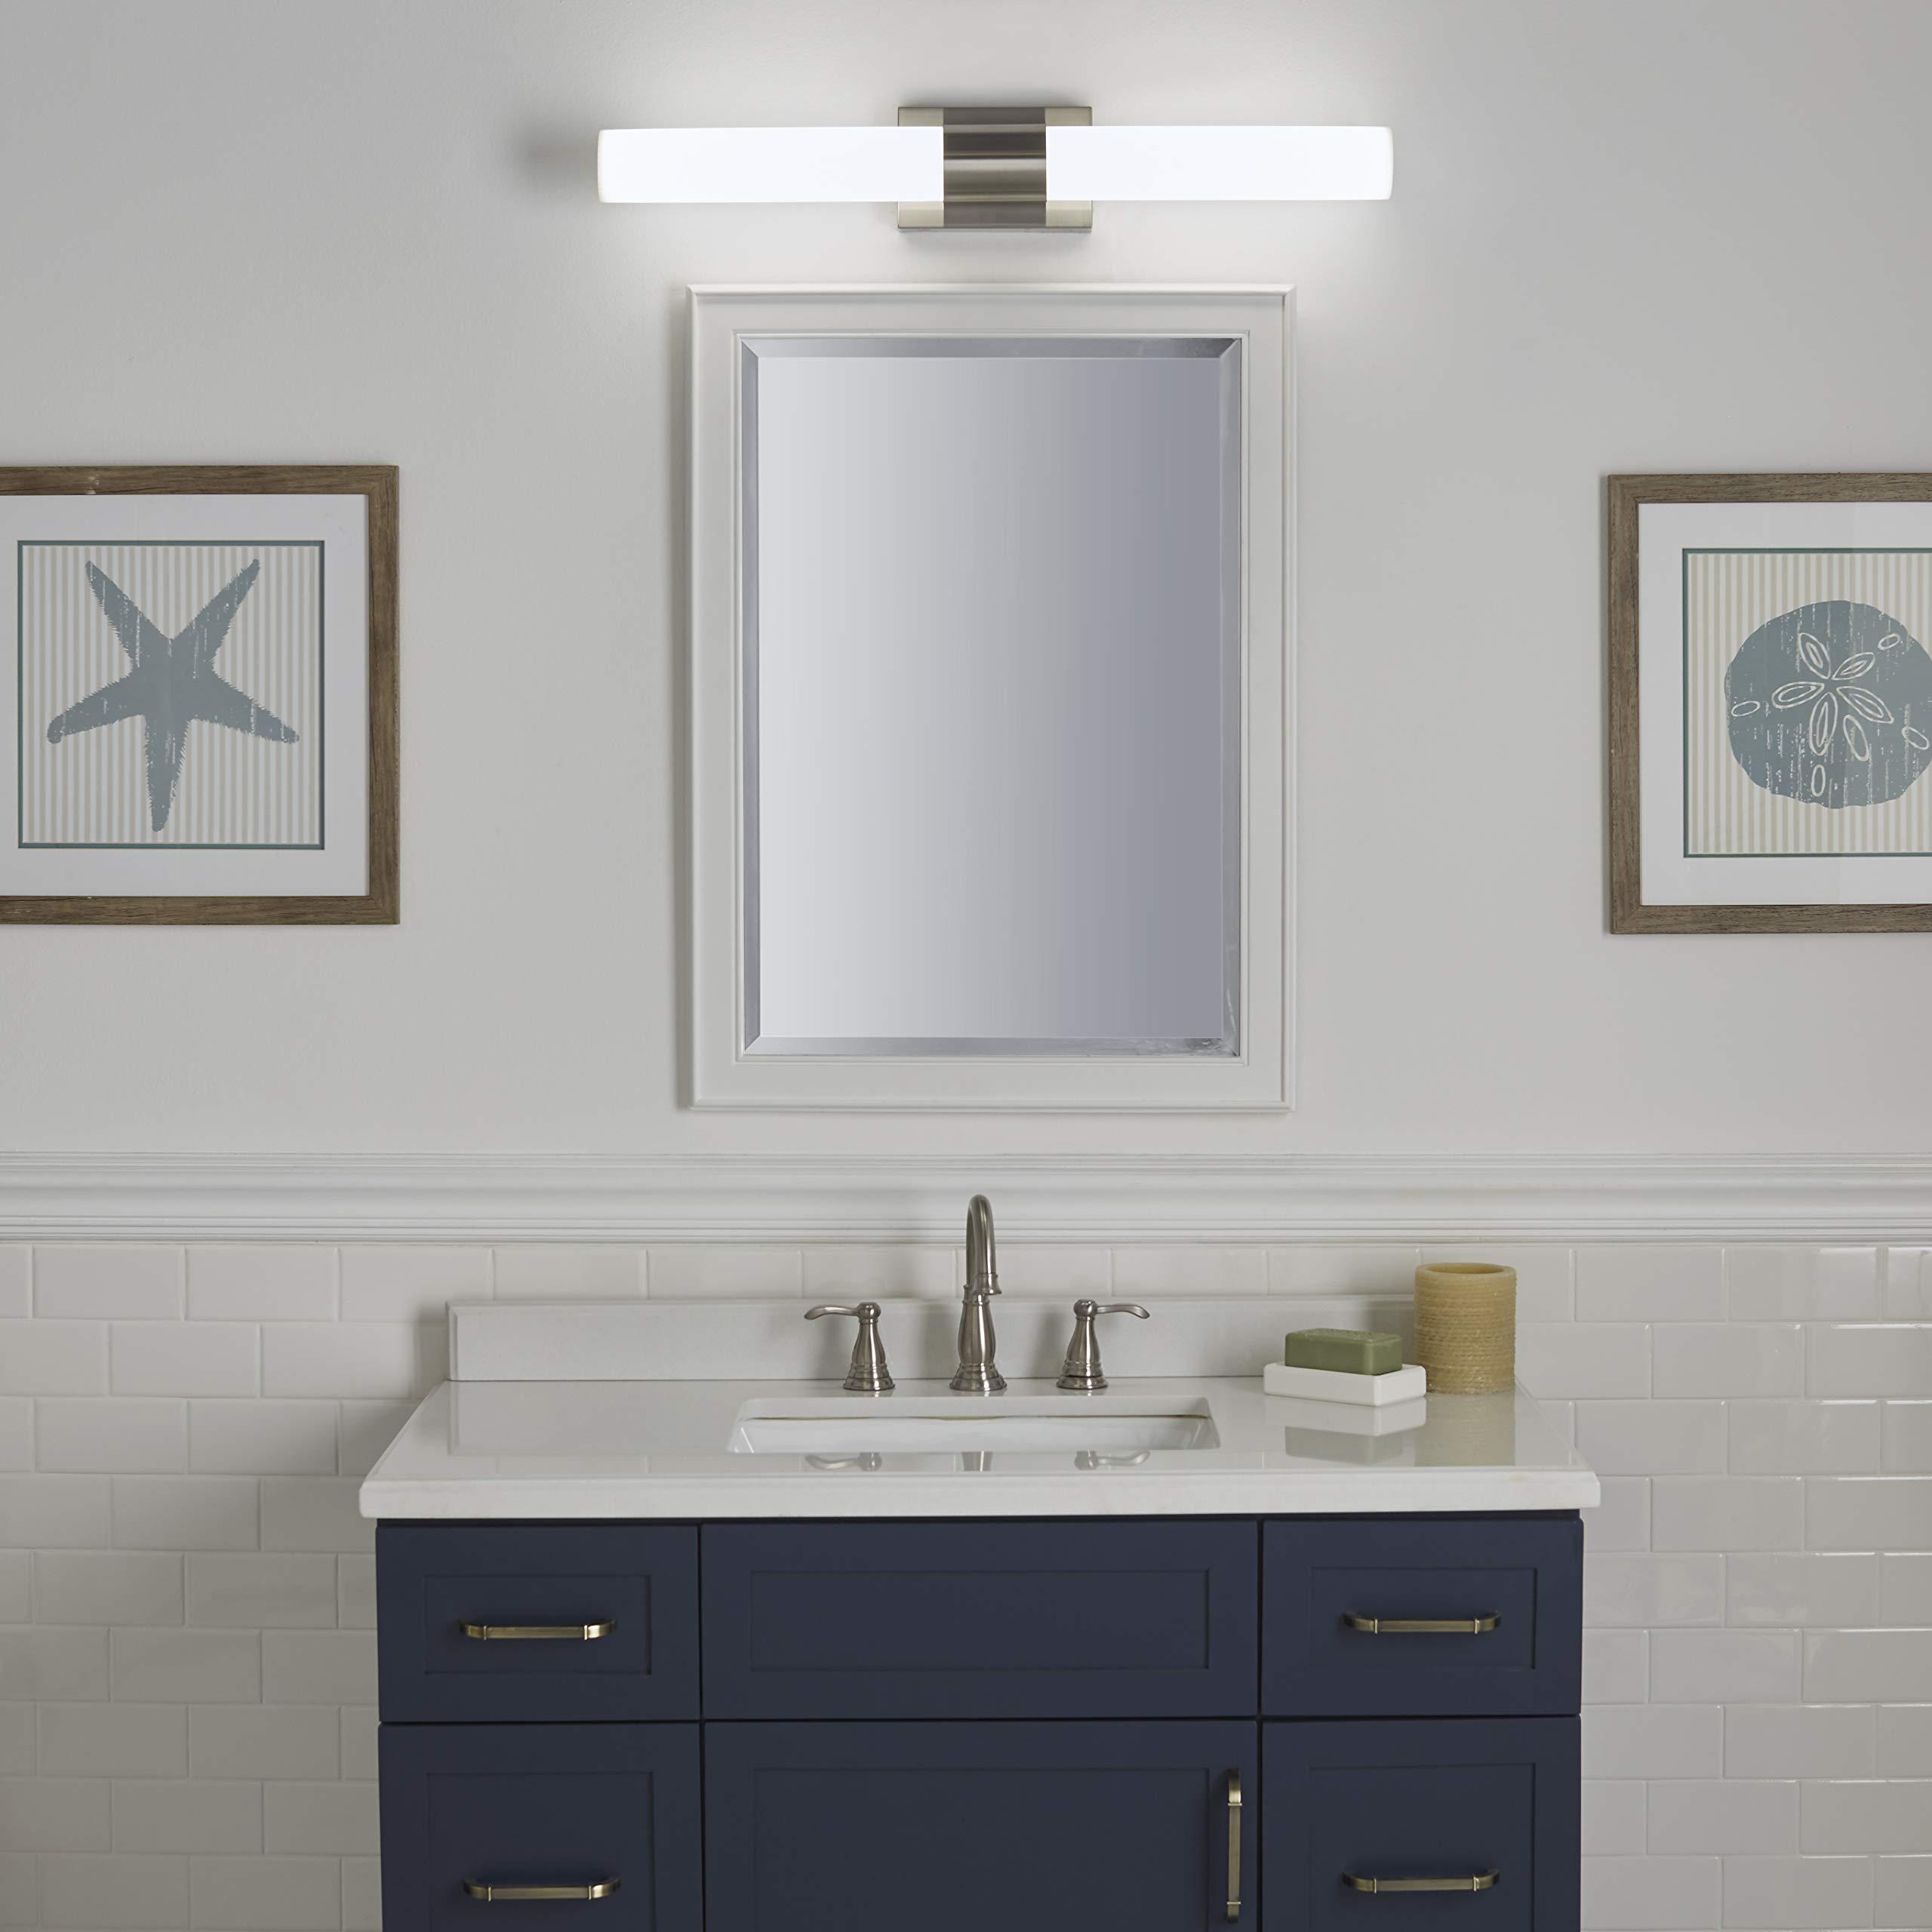 Perpetua 30 inch Integrated LED Bathroom Vanity Lights | Brushed Nickel Bathroom Light LL-SC1043-BN by Linea di Liara (Image #5)